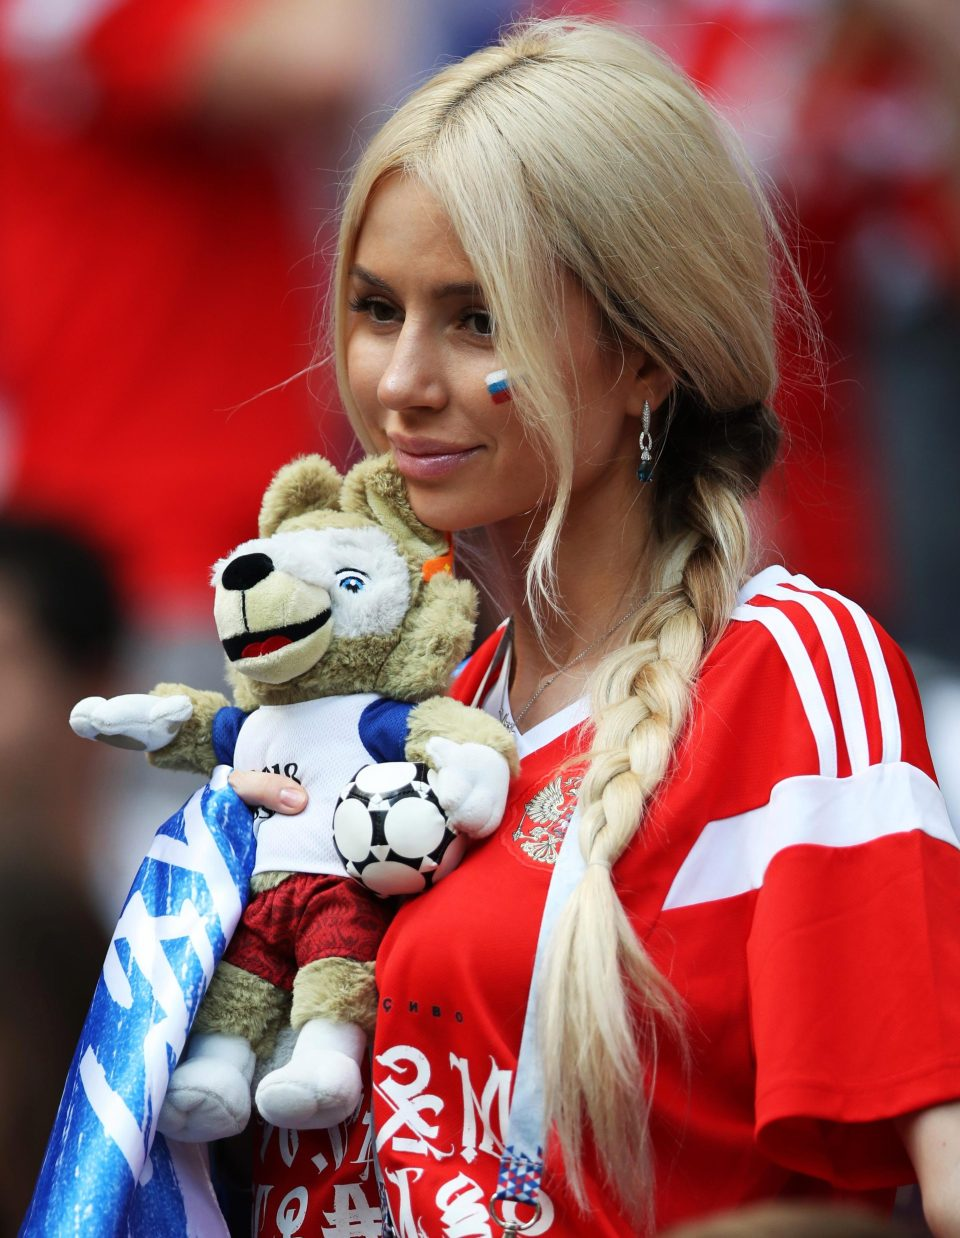 'Fan dep nhat World Cup' ngay ngat trong chien thang lich su cua Nga hinh anh 5